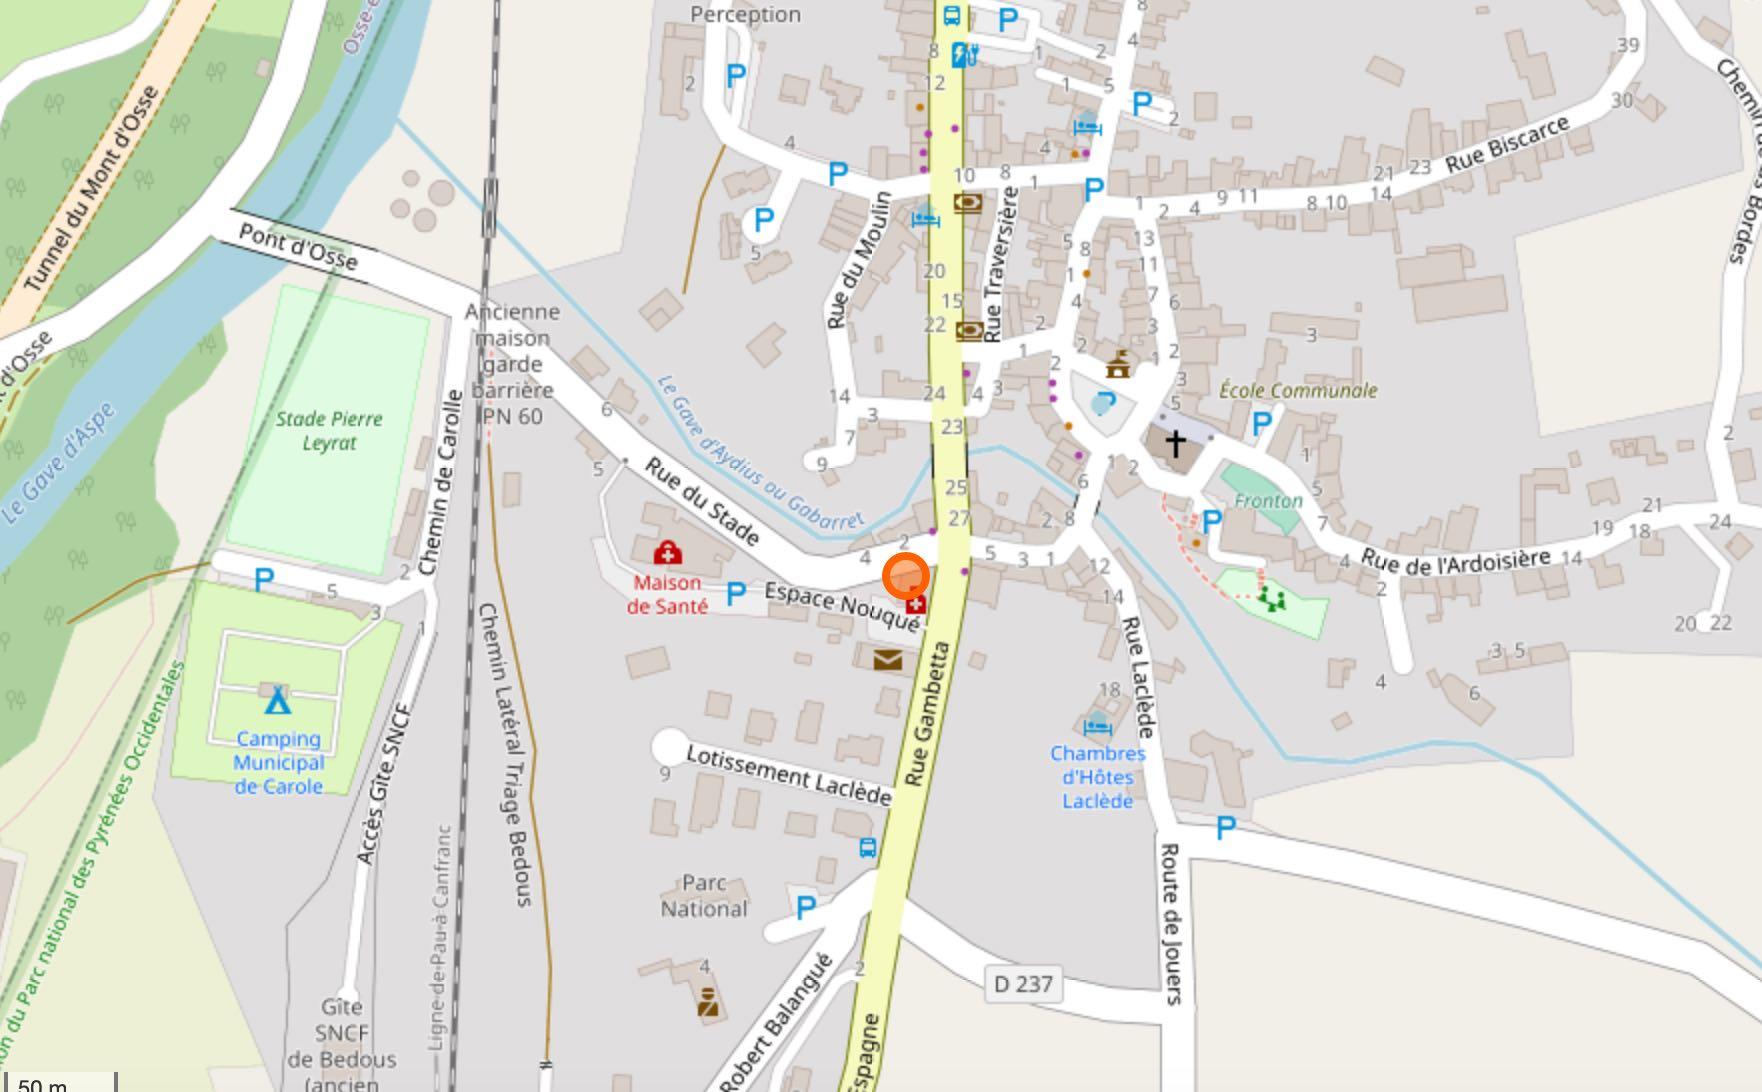 Cartographie fournie par Openstreet Map.